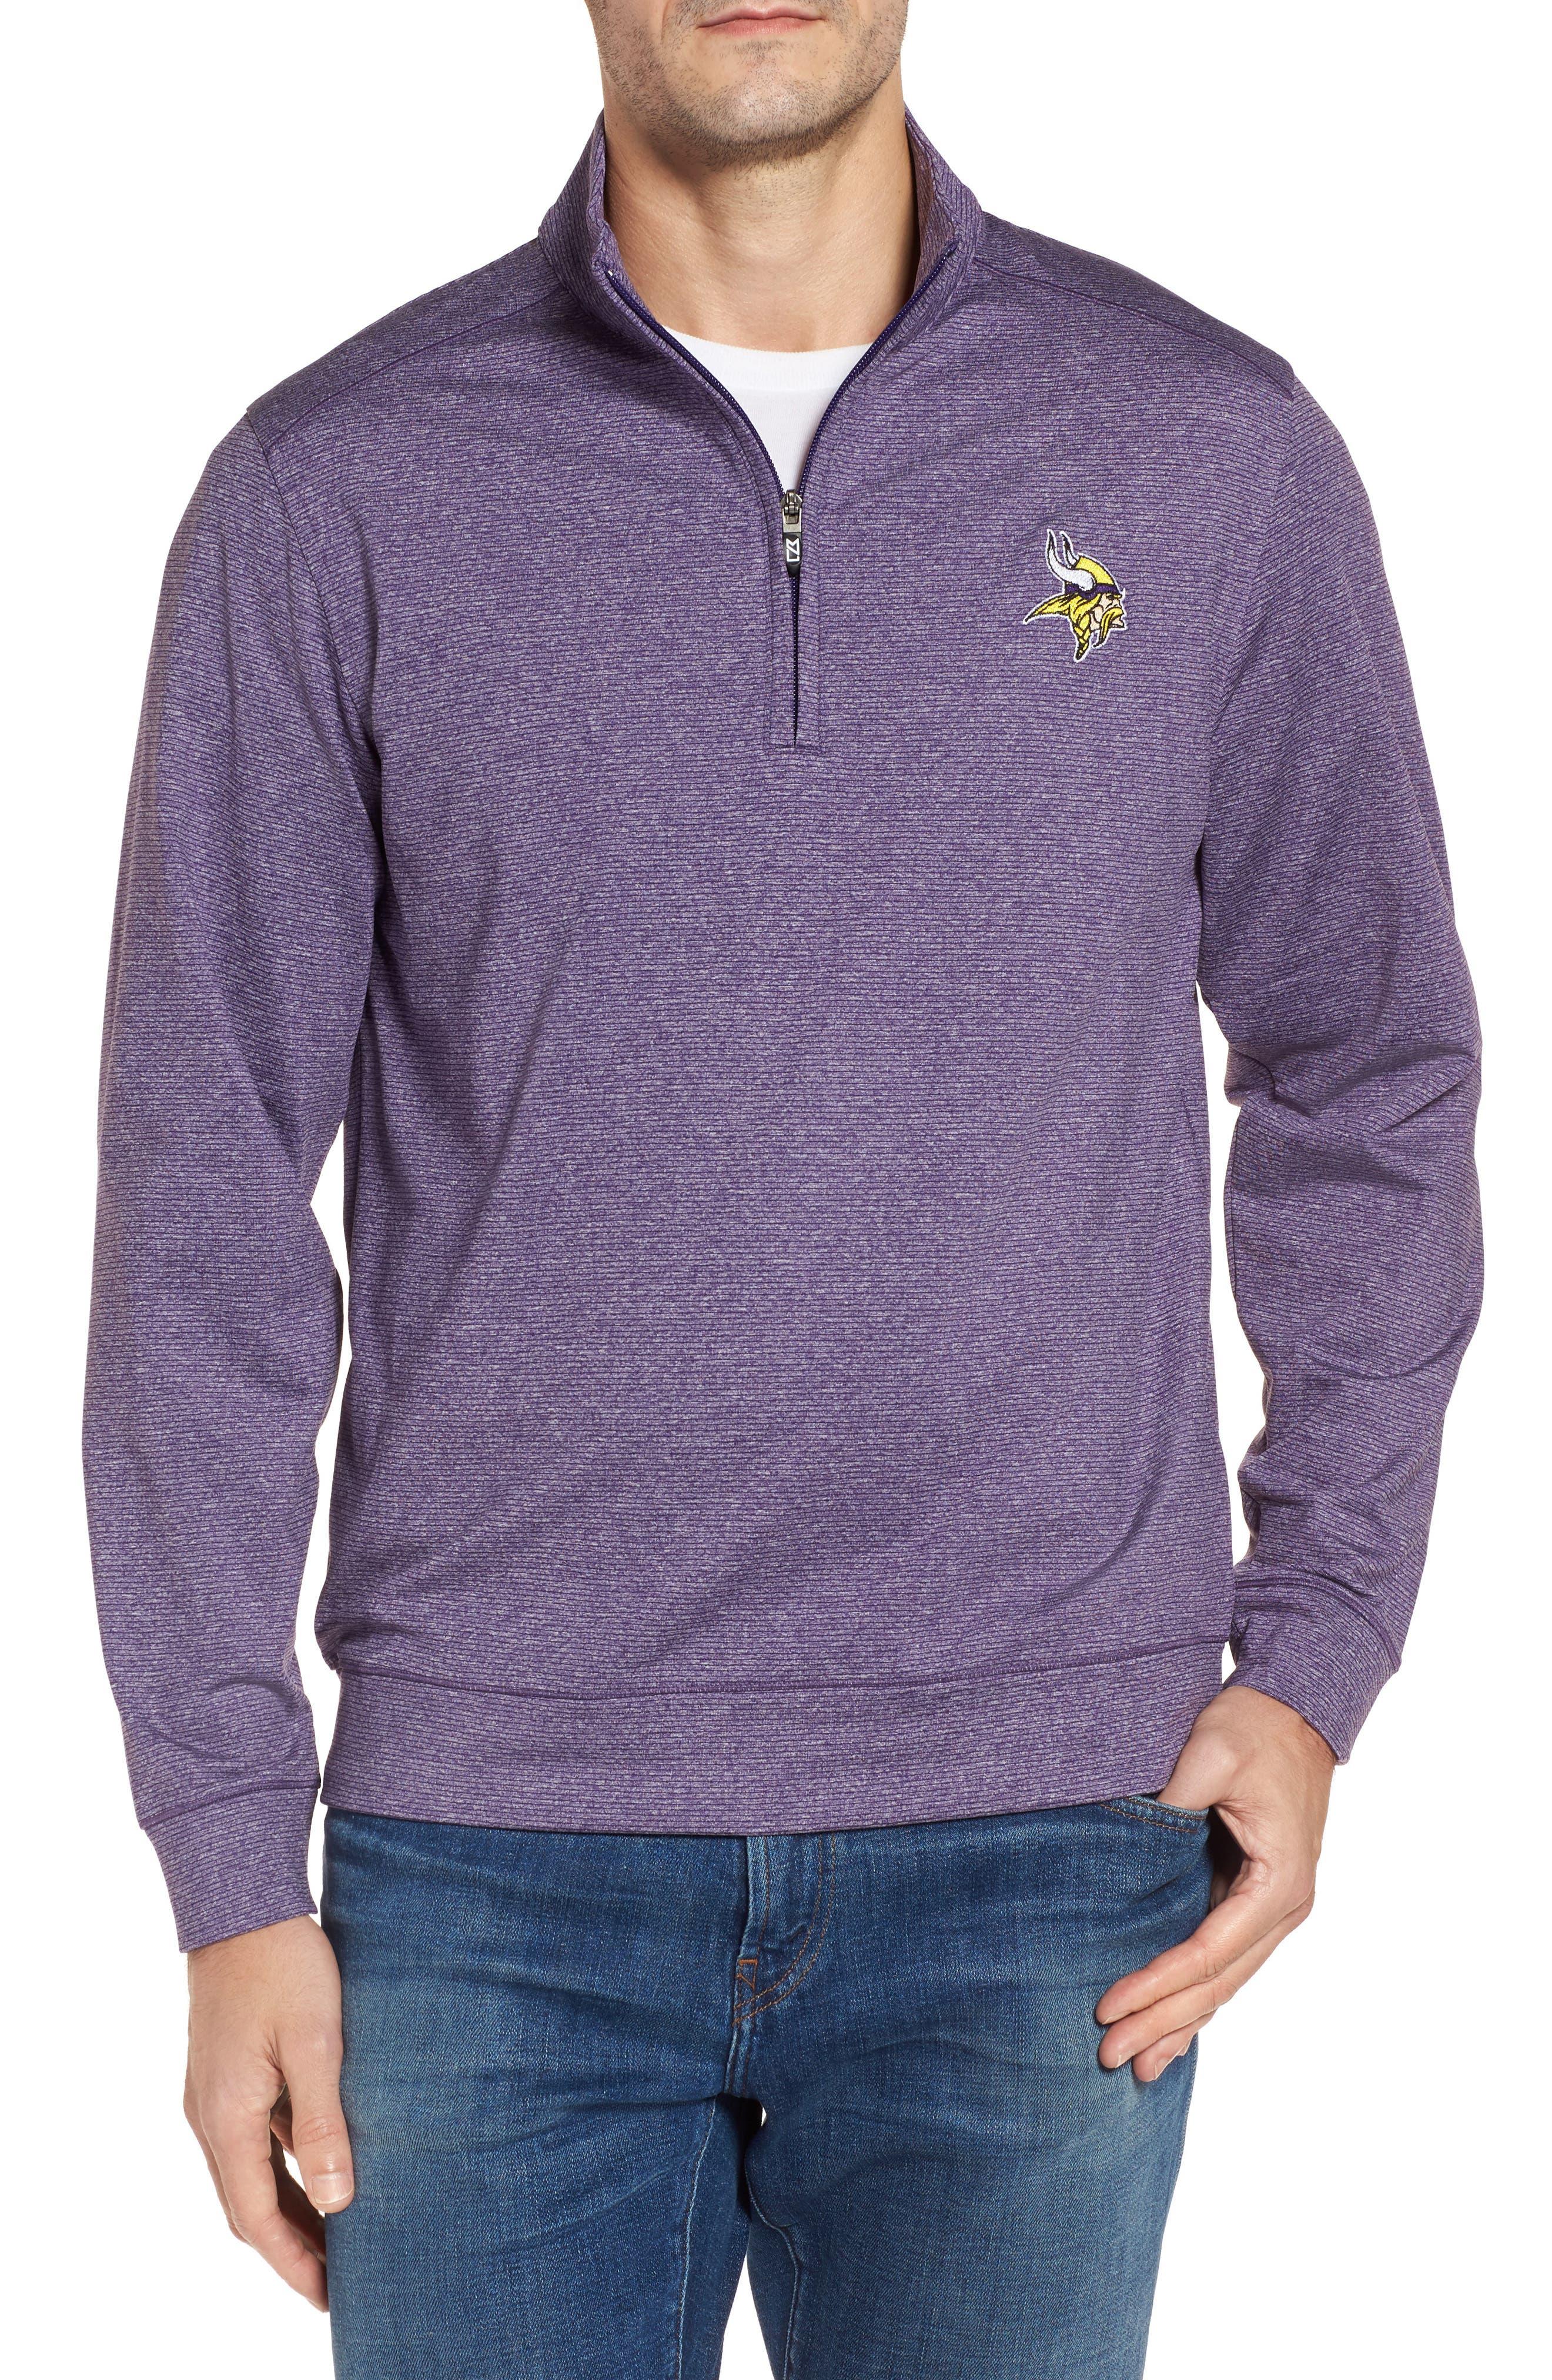 Shoreline - Minnesota Vikings Half Zip Pullover,                             Main thumbnail 1, color,                             College Purple Heather